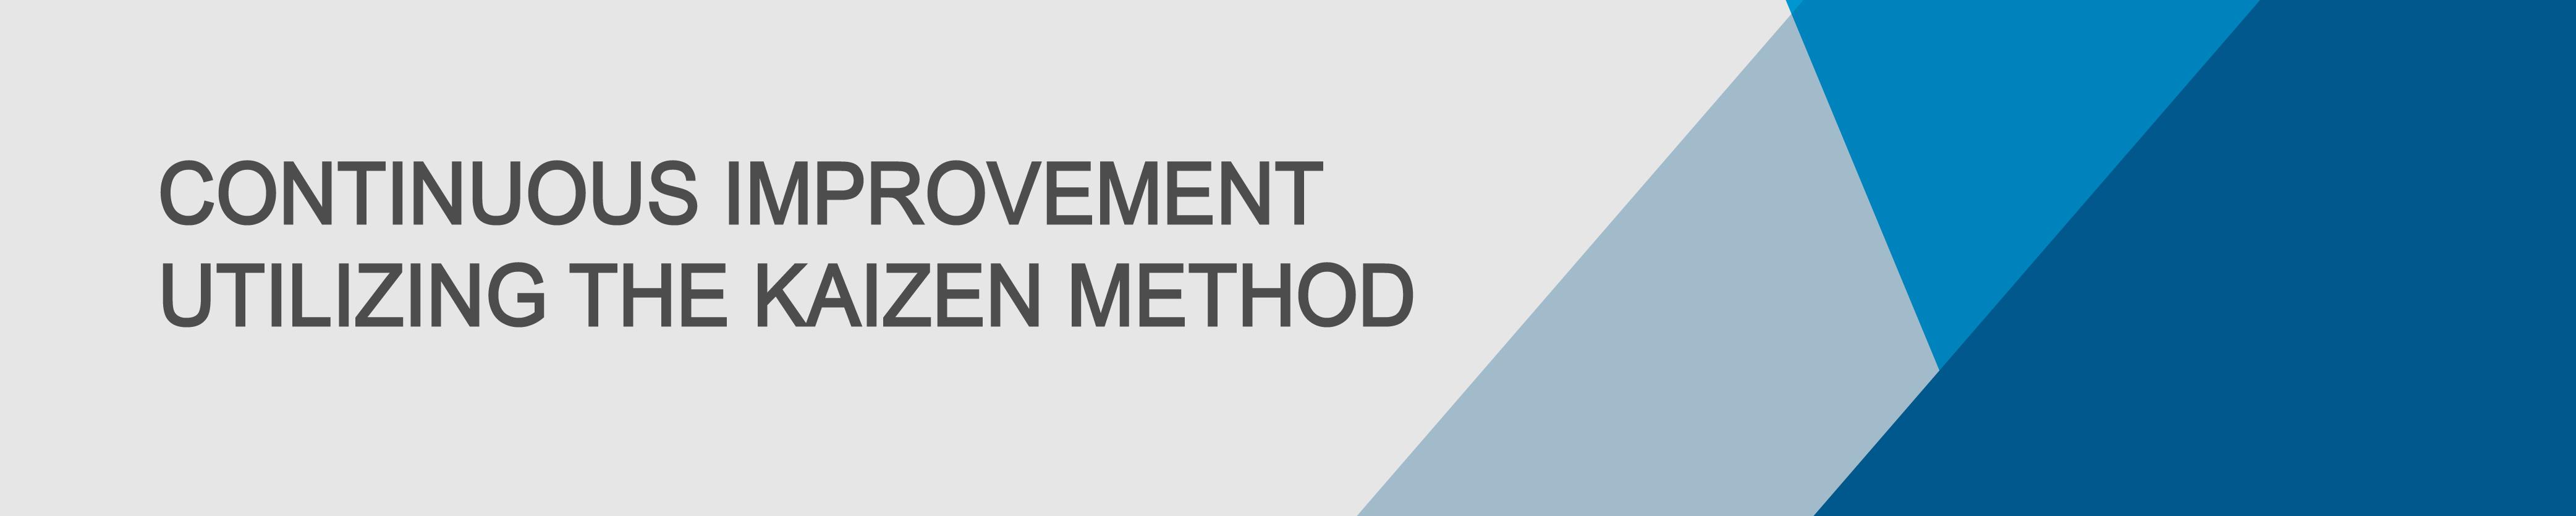 Continuous Improvement Utilizing The Kaizen Method